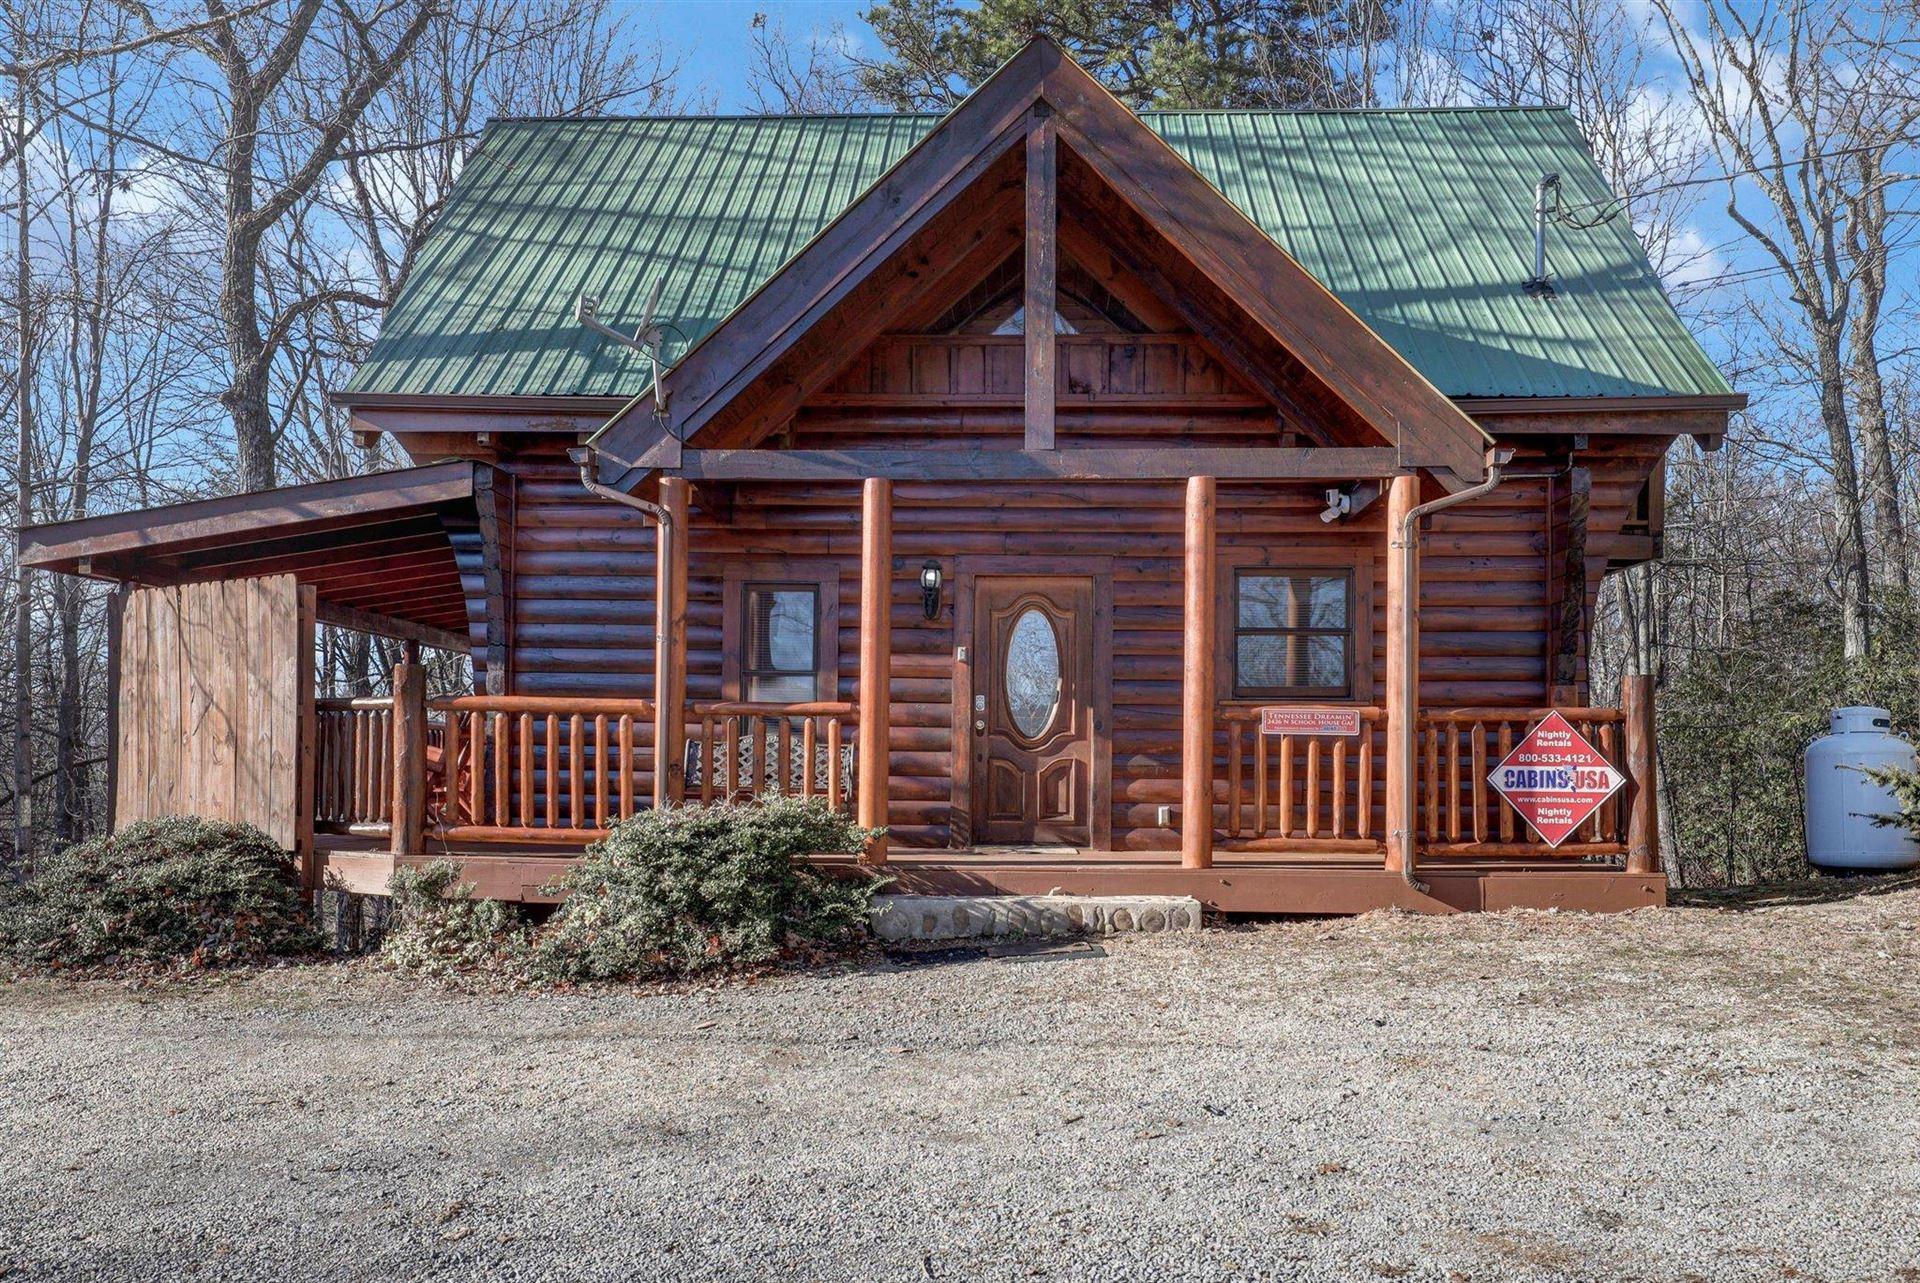 Photo of 2426 N School House Gap Rd, Sevierville, TN 37876 (MLS # 1140216)